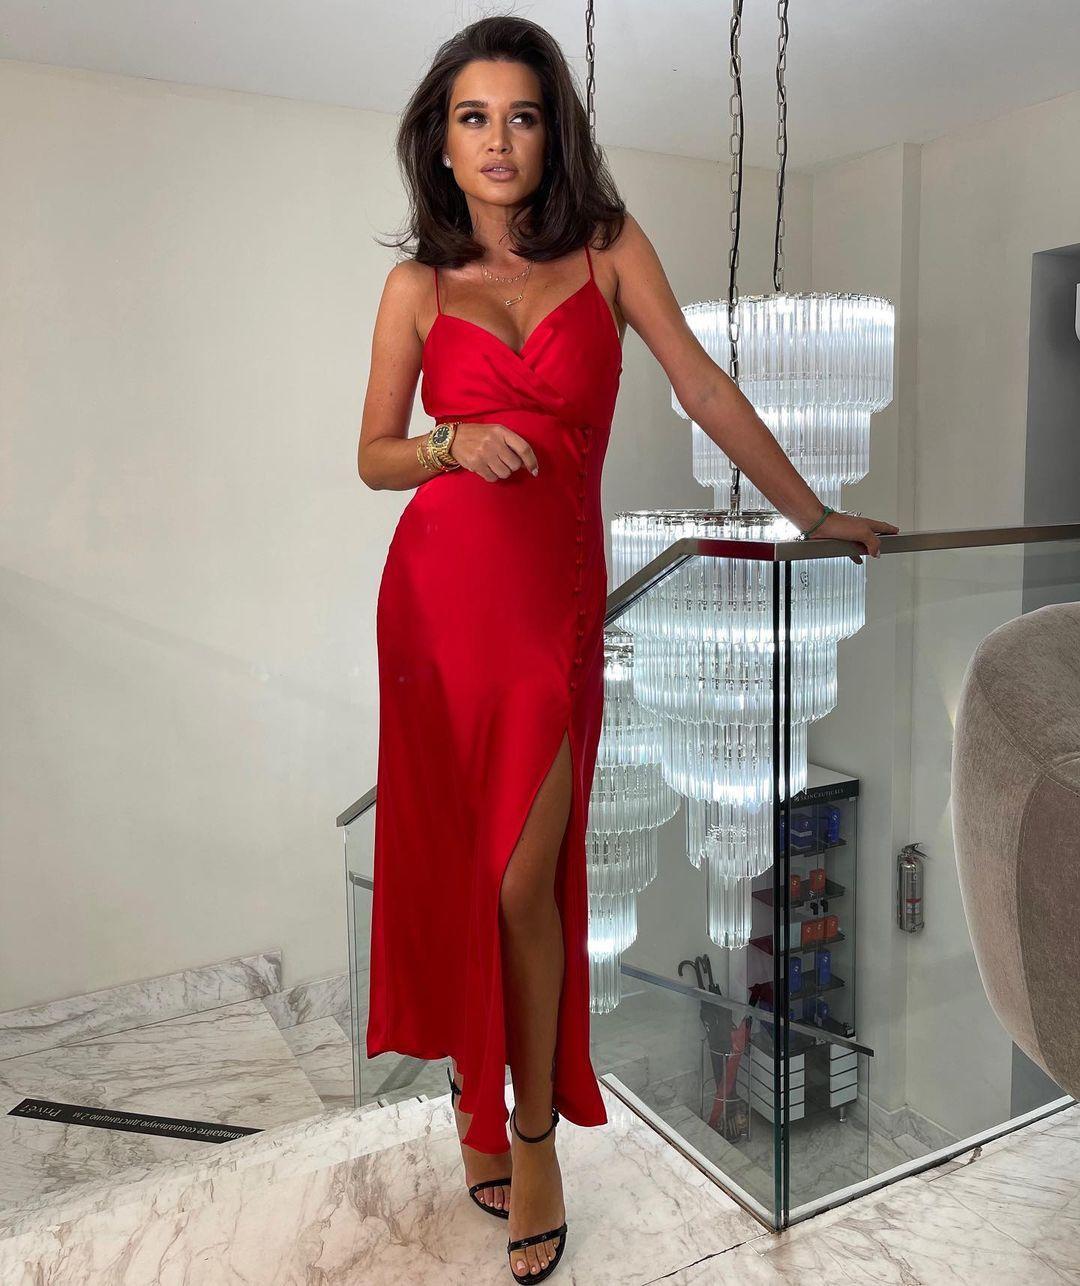 Ksenia Borodina said that she will no longer marry